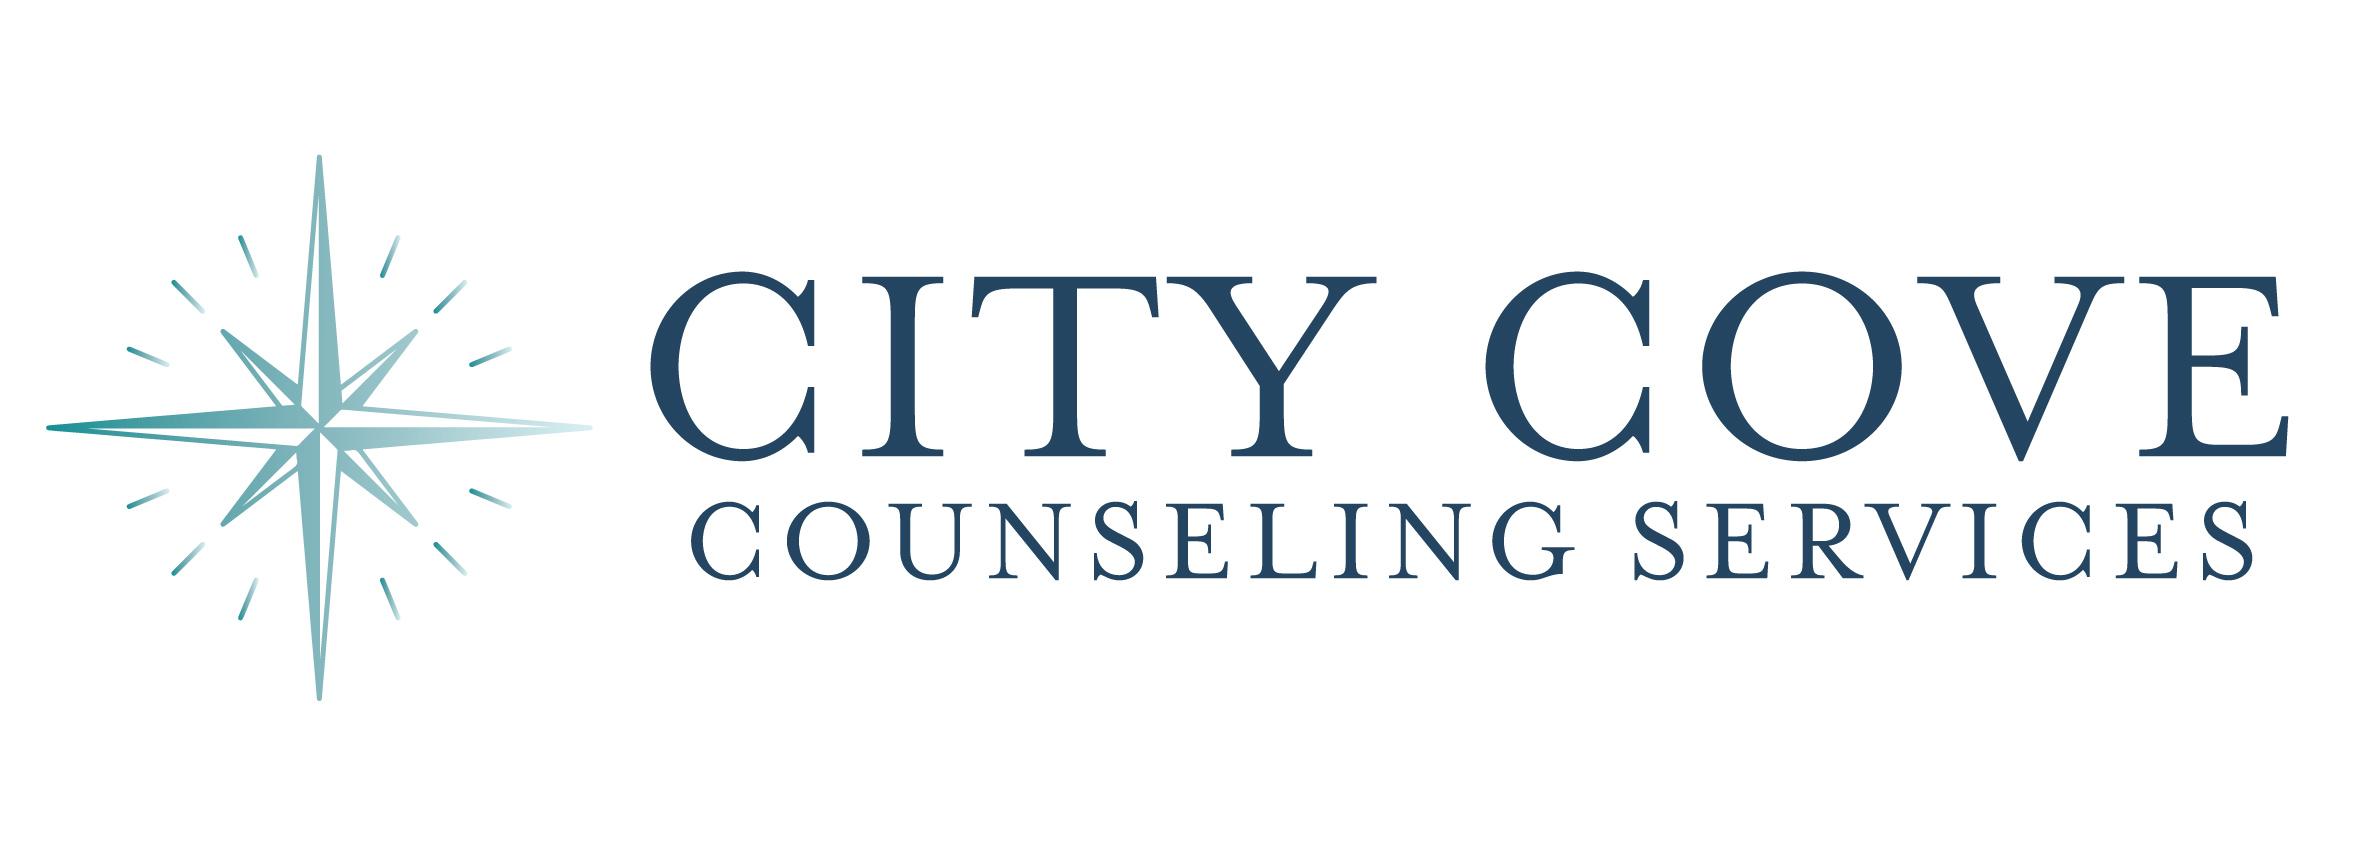 City Cove Final_Main Logo.jpg